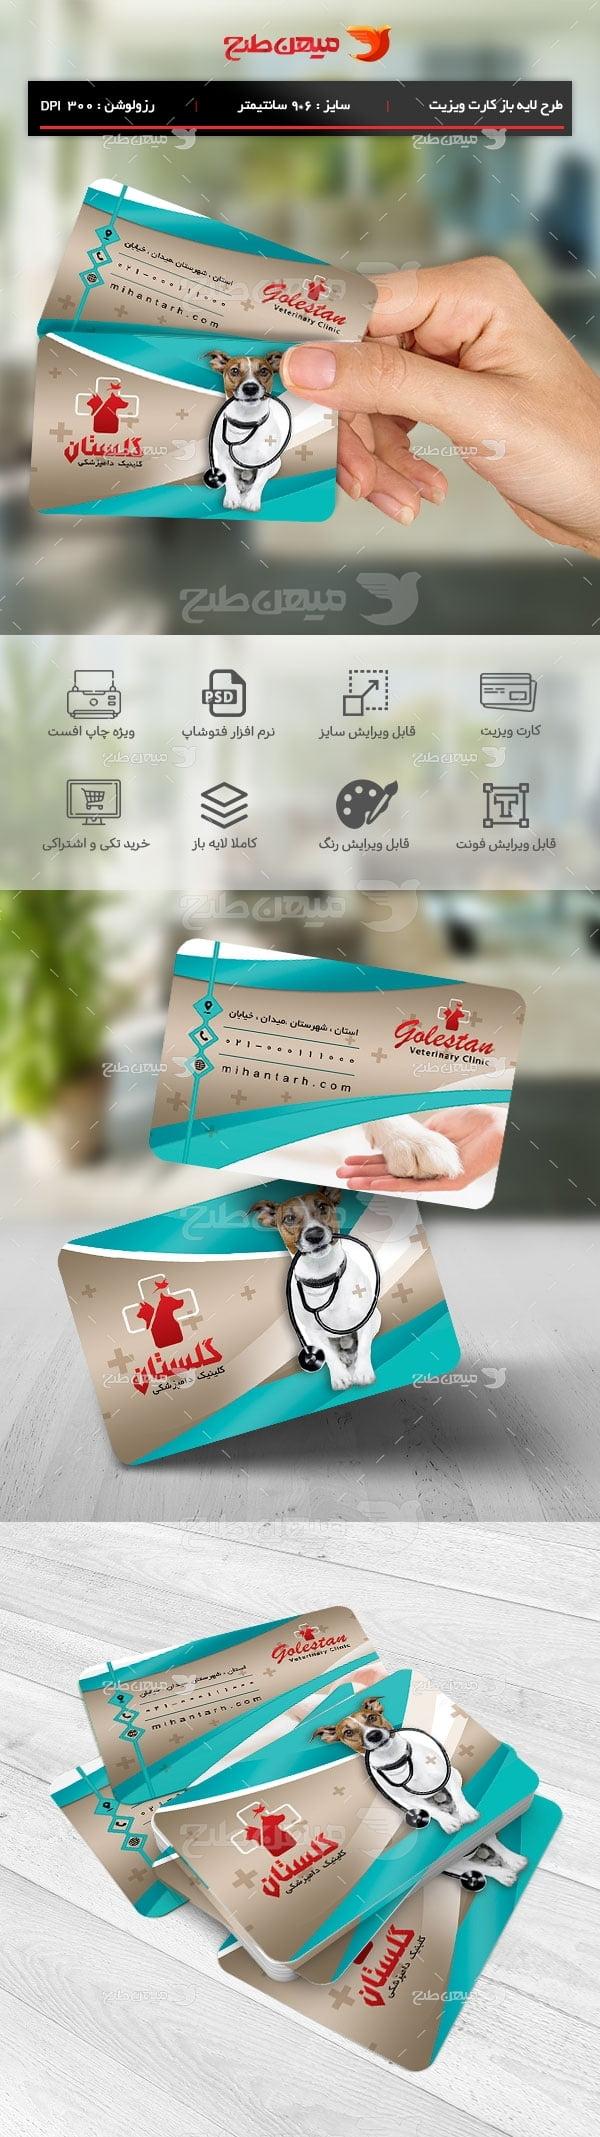 طرح لایه باز کارت ویزیت دامپزشکی